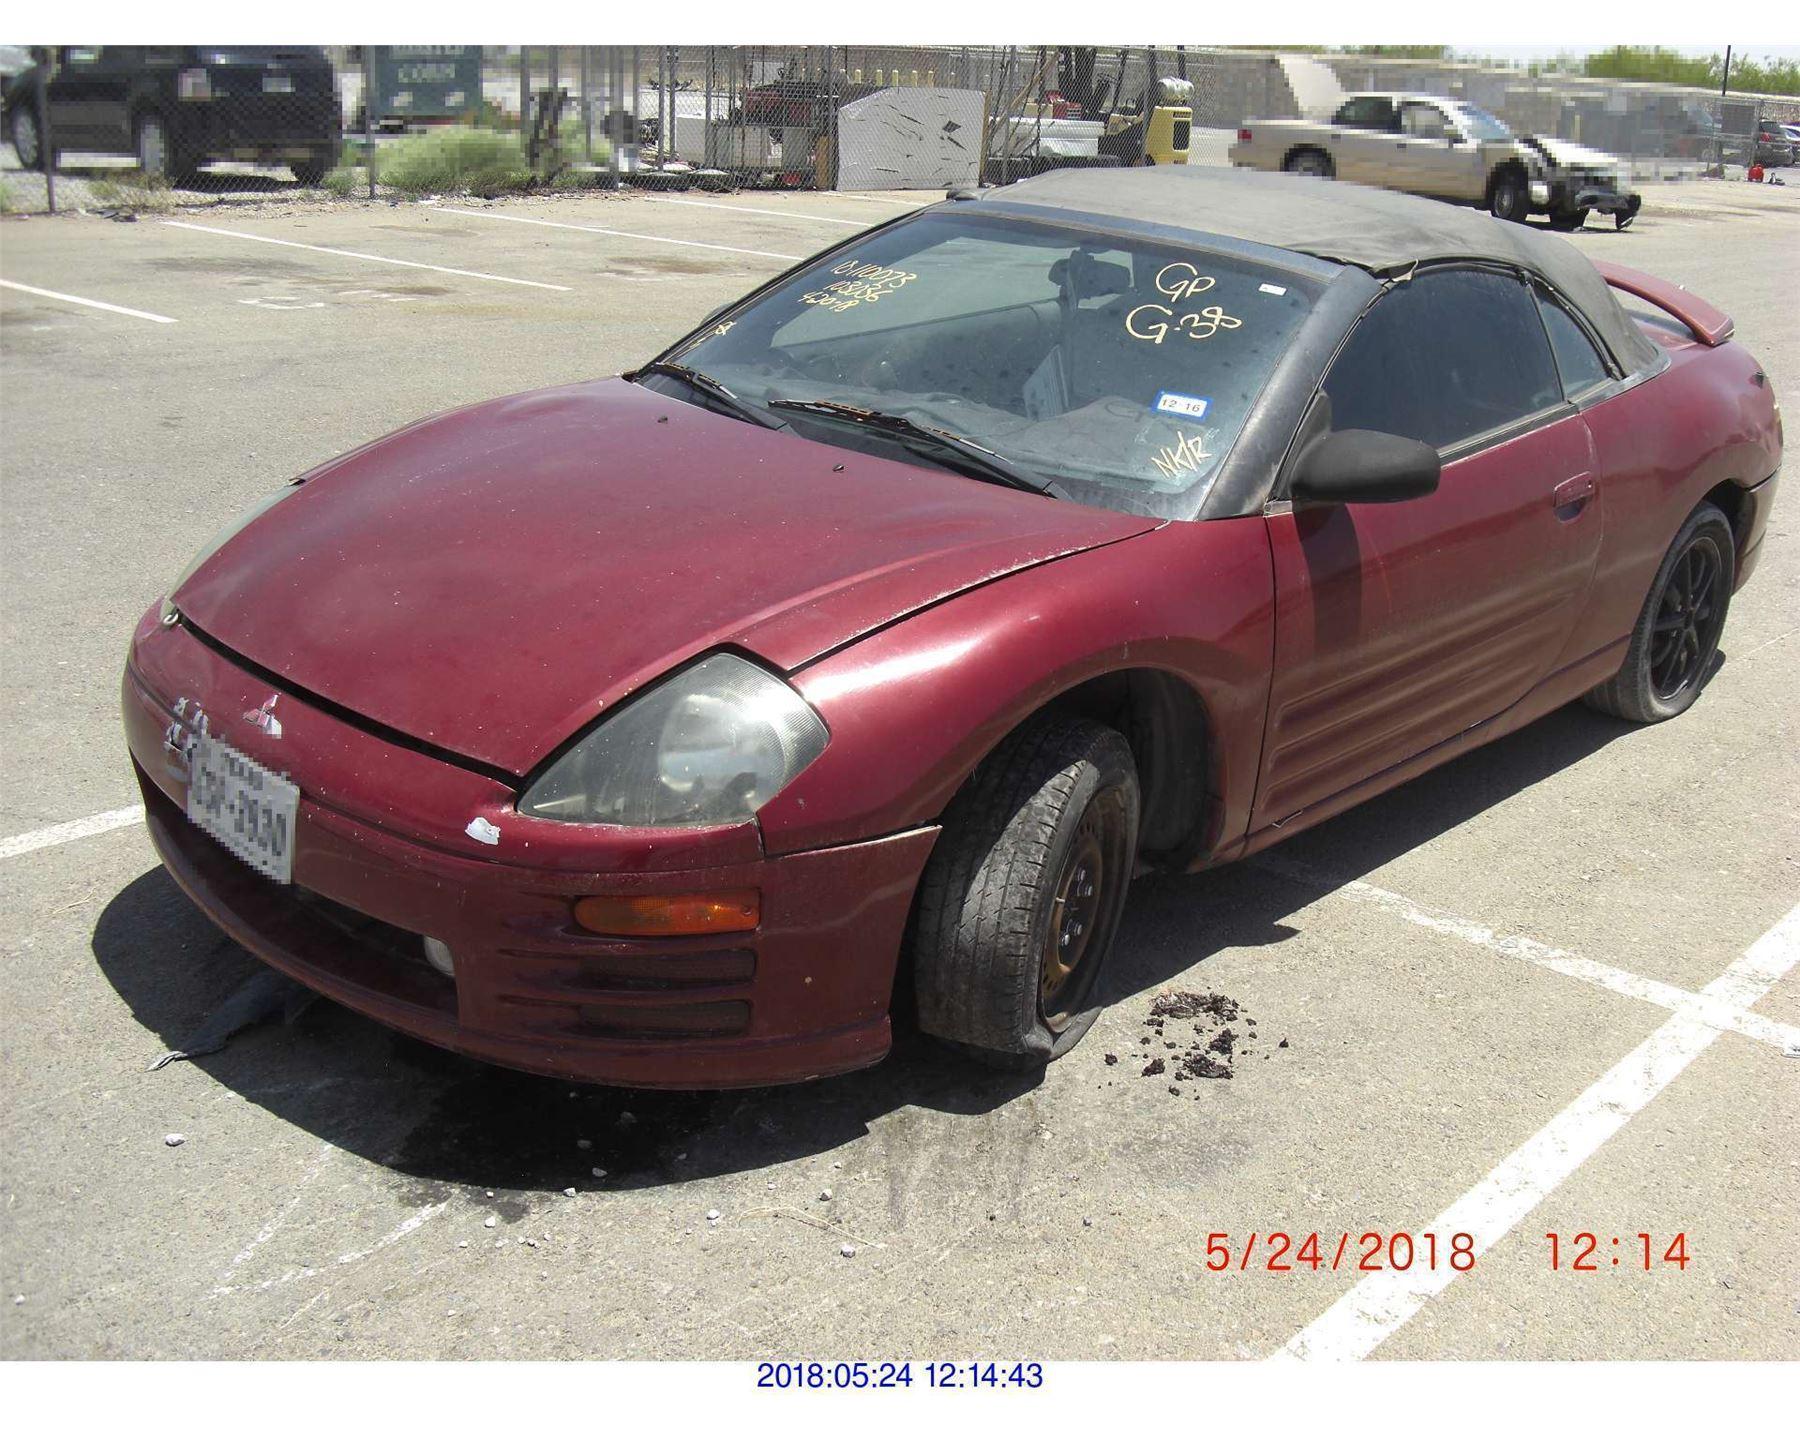 2001 - Mitsubishi Eclipse